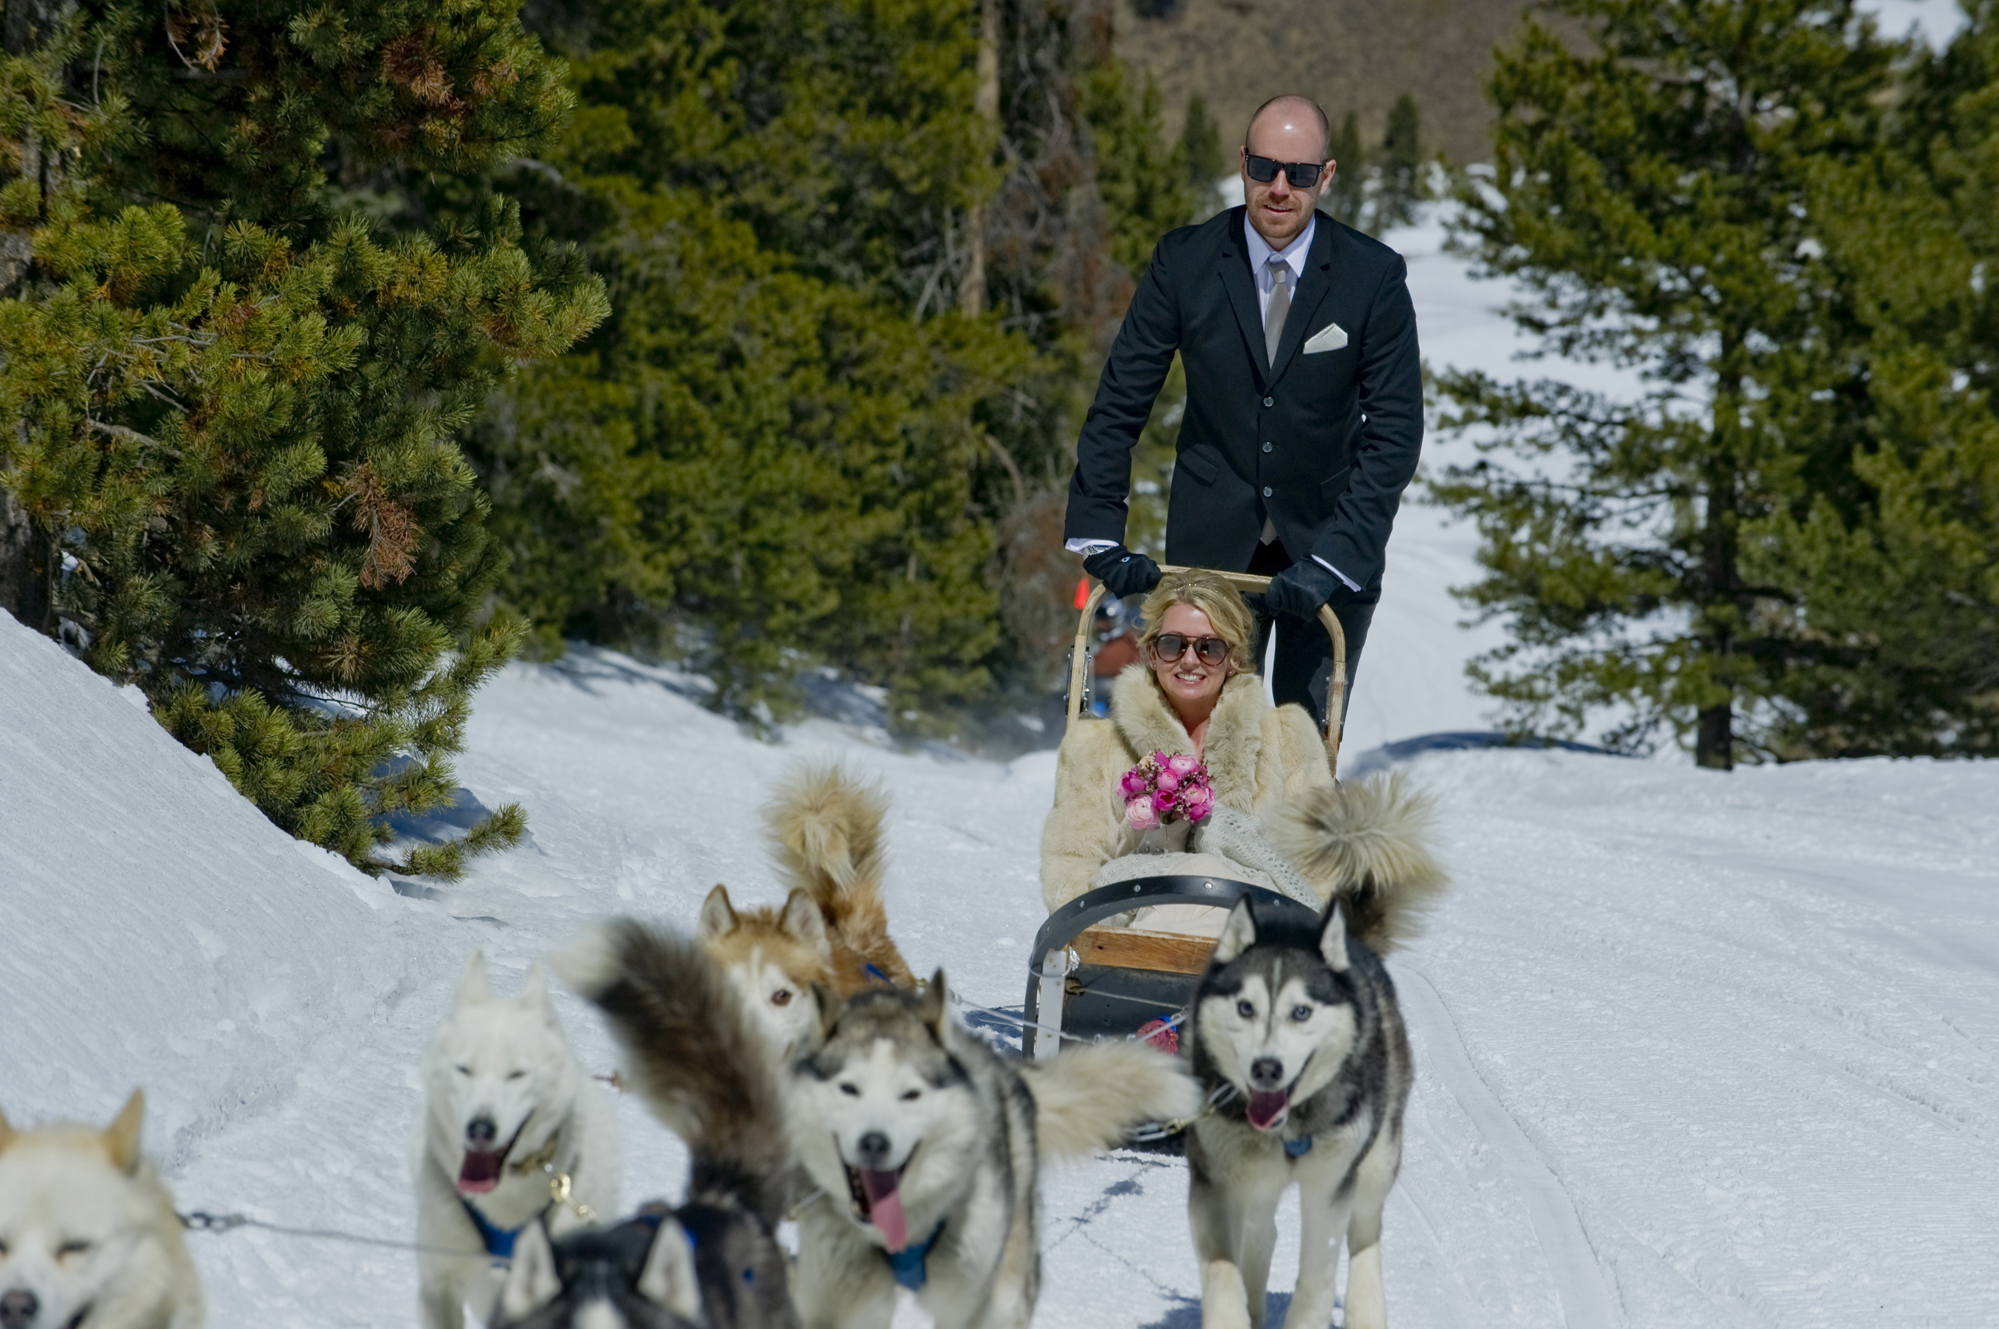 Winter wonderland mountain fun